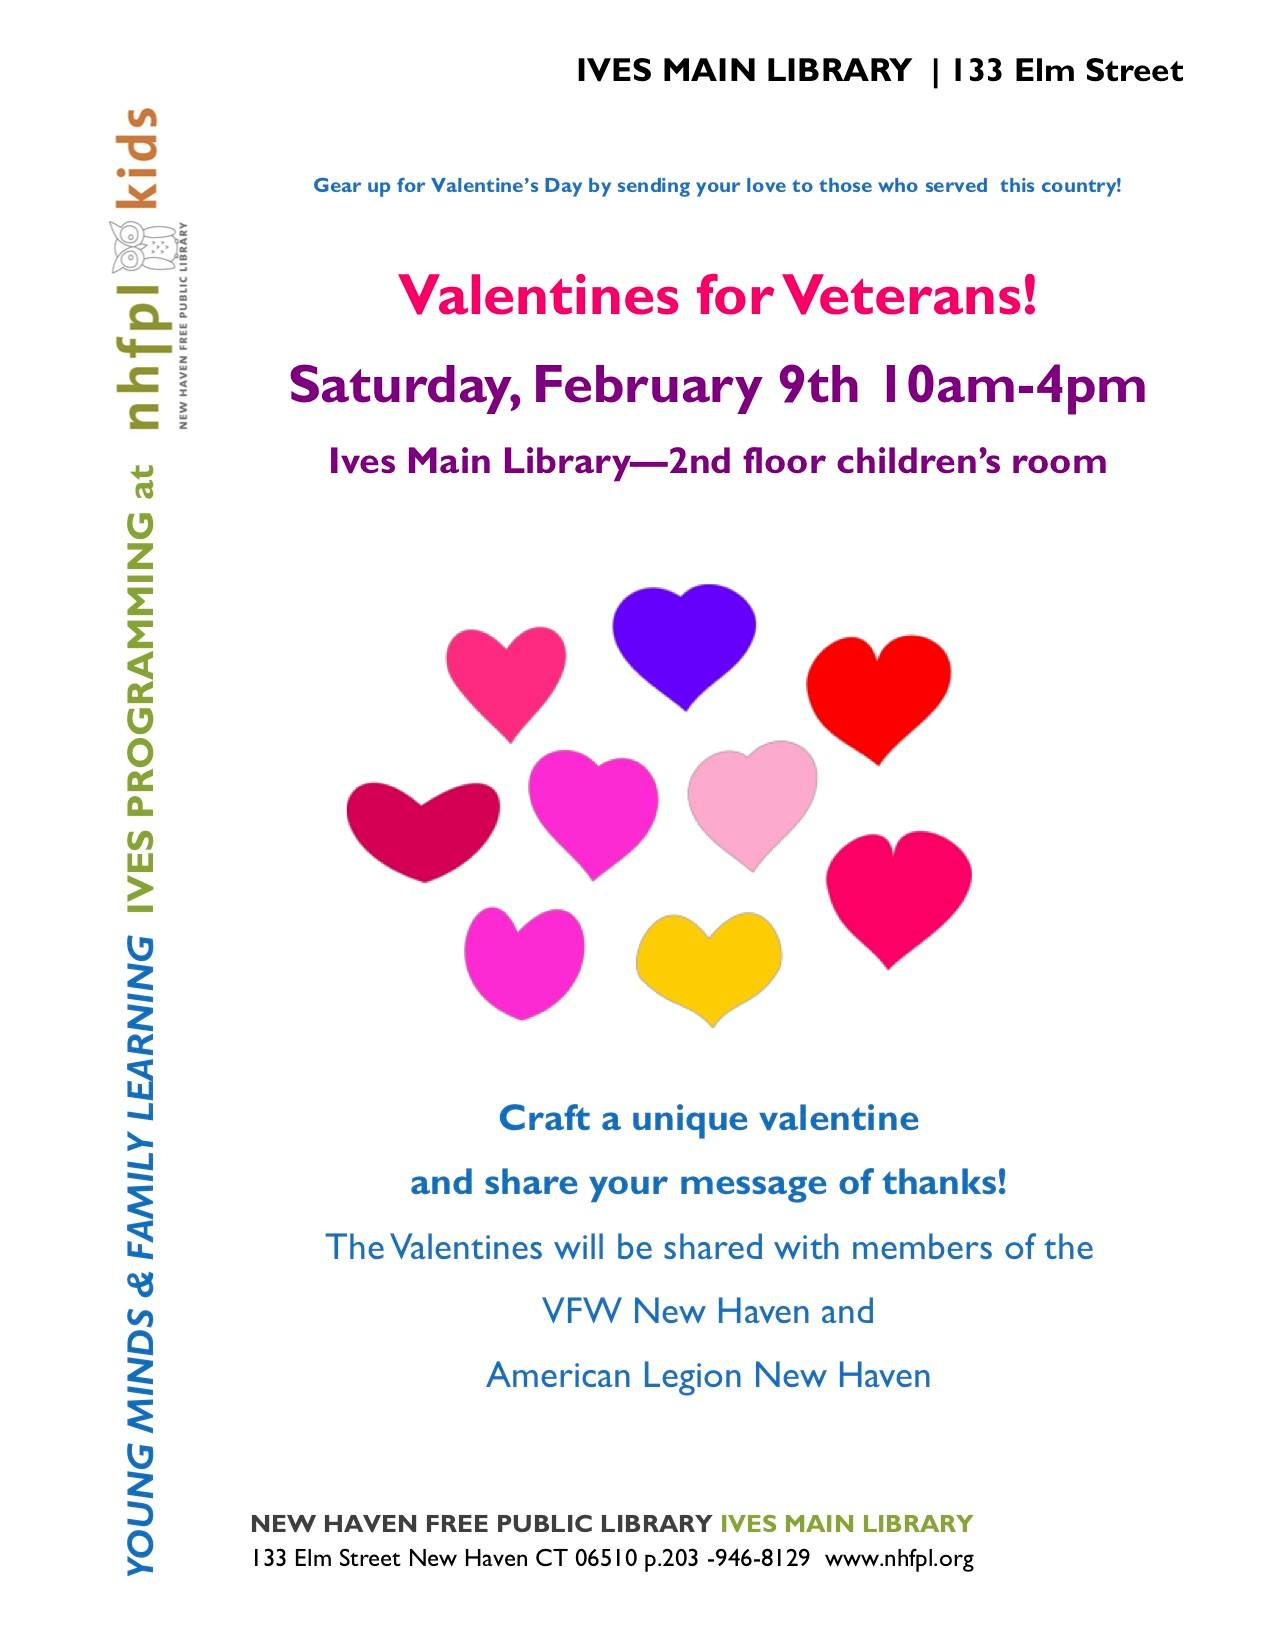 Valentines for Veterans!